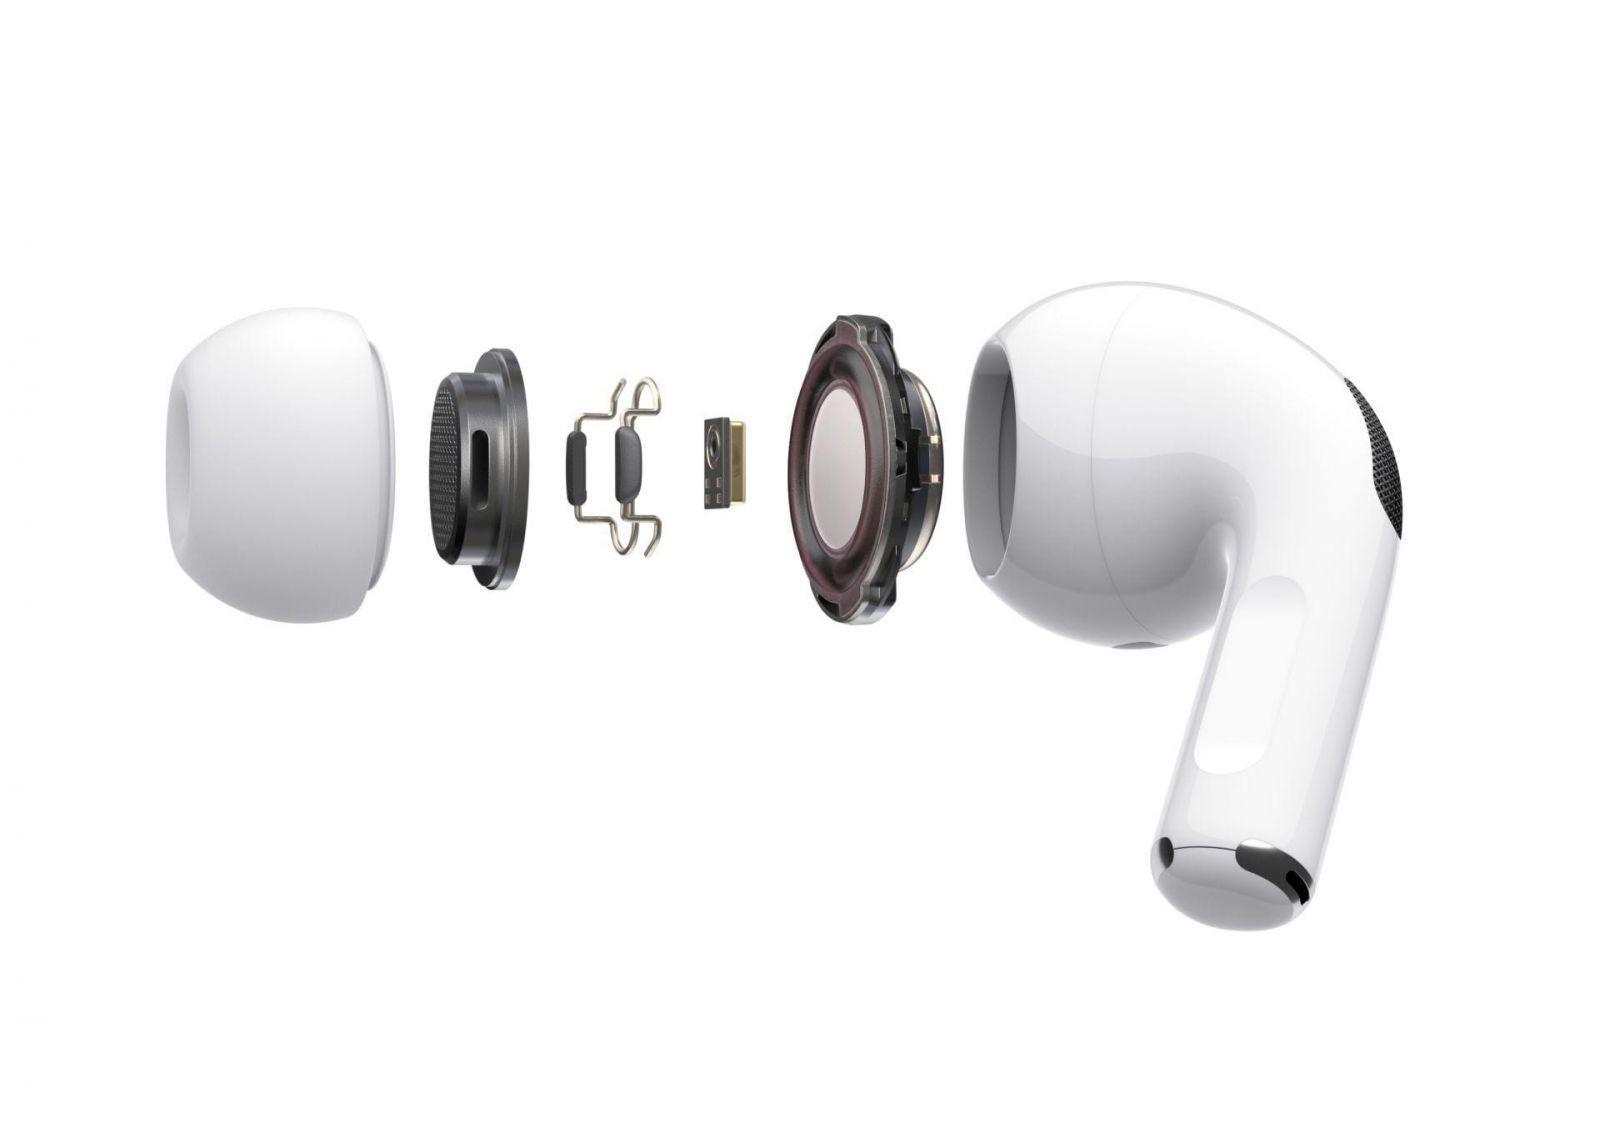 Apple выпустила AirPods Pro c шумоподавлением (apple airpods)